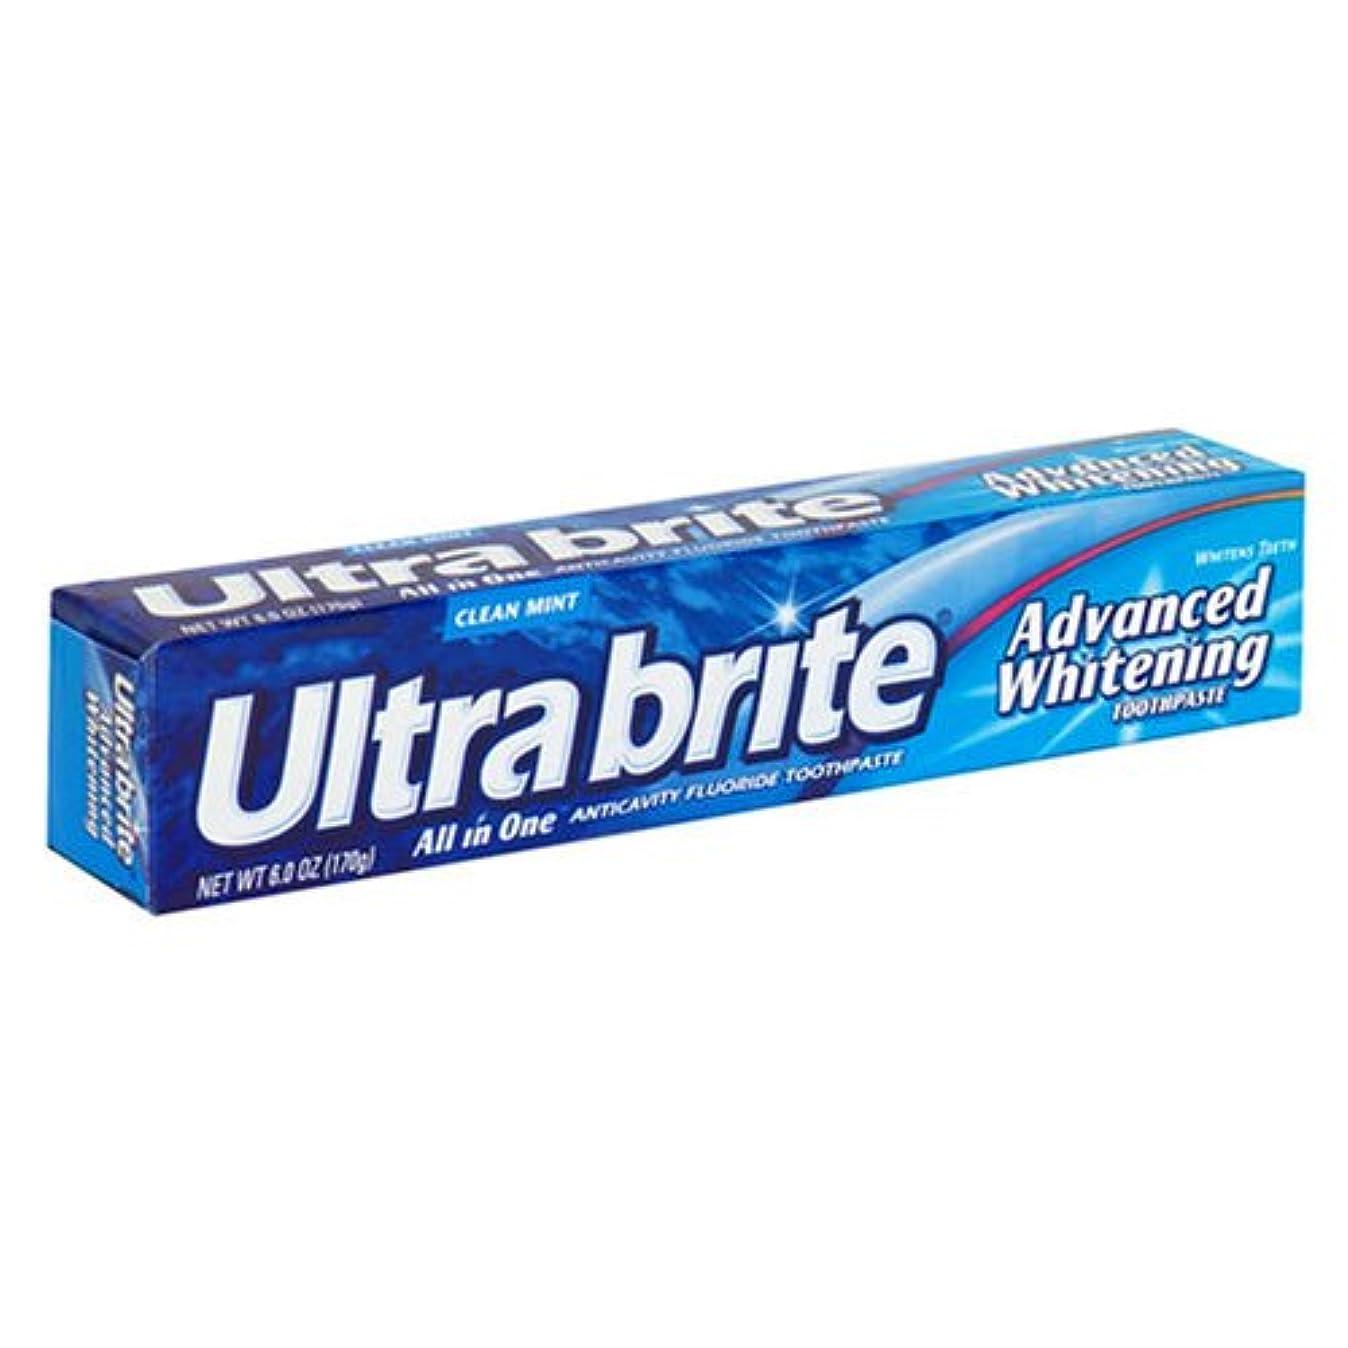 市の中心部香り作家海外直送肘 Colgate Ultra Brite Advanced Whitening Fluoride Toothpaste, 6 oz